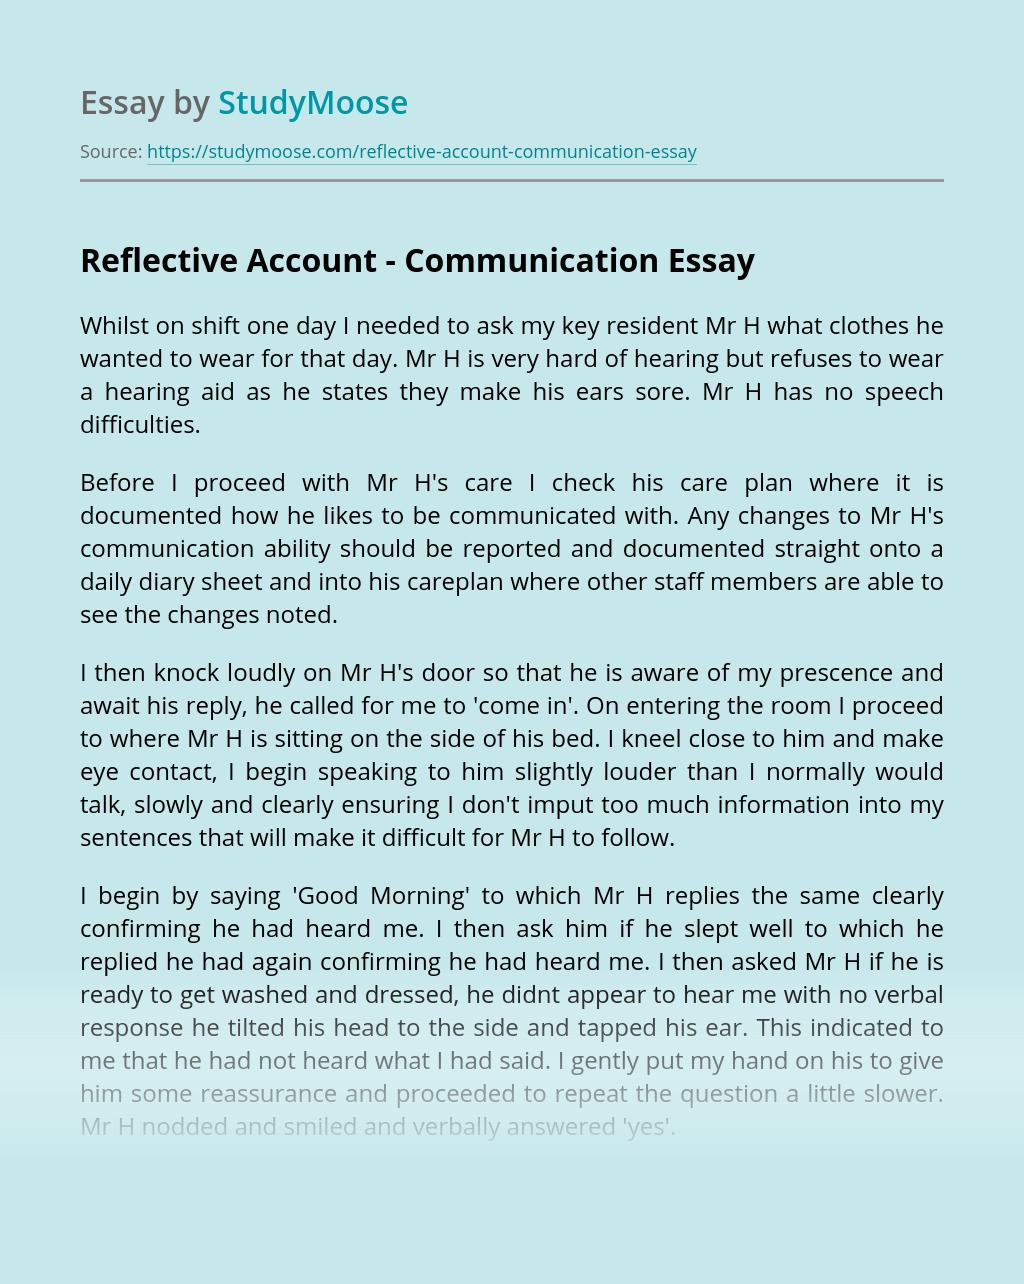 Reflective Account - Communication